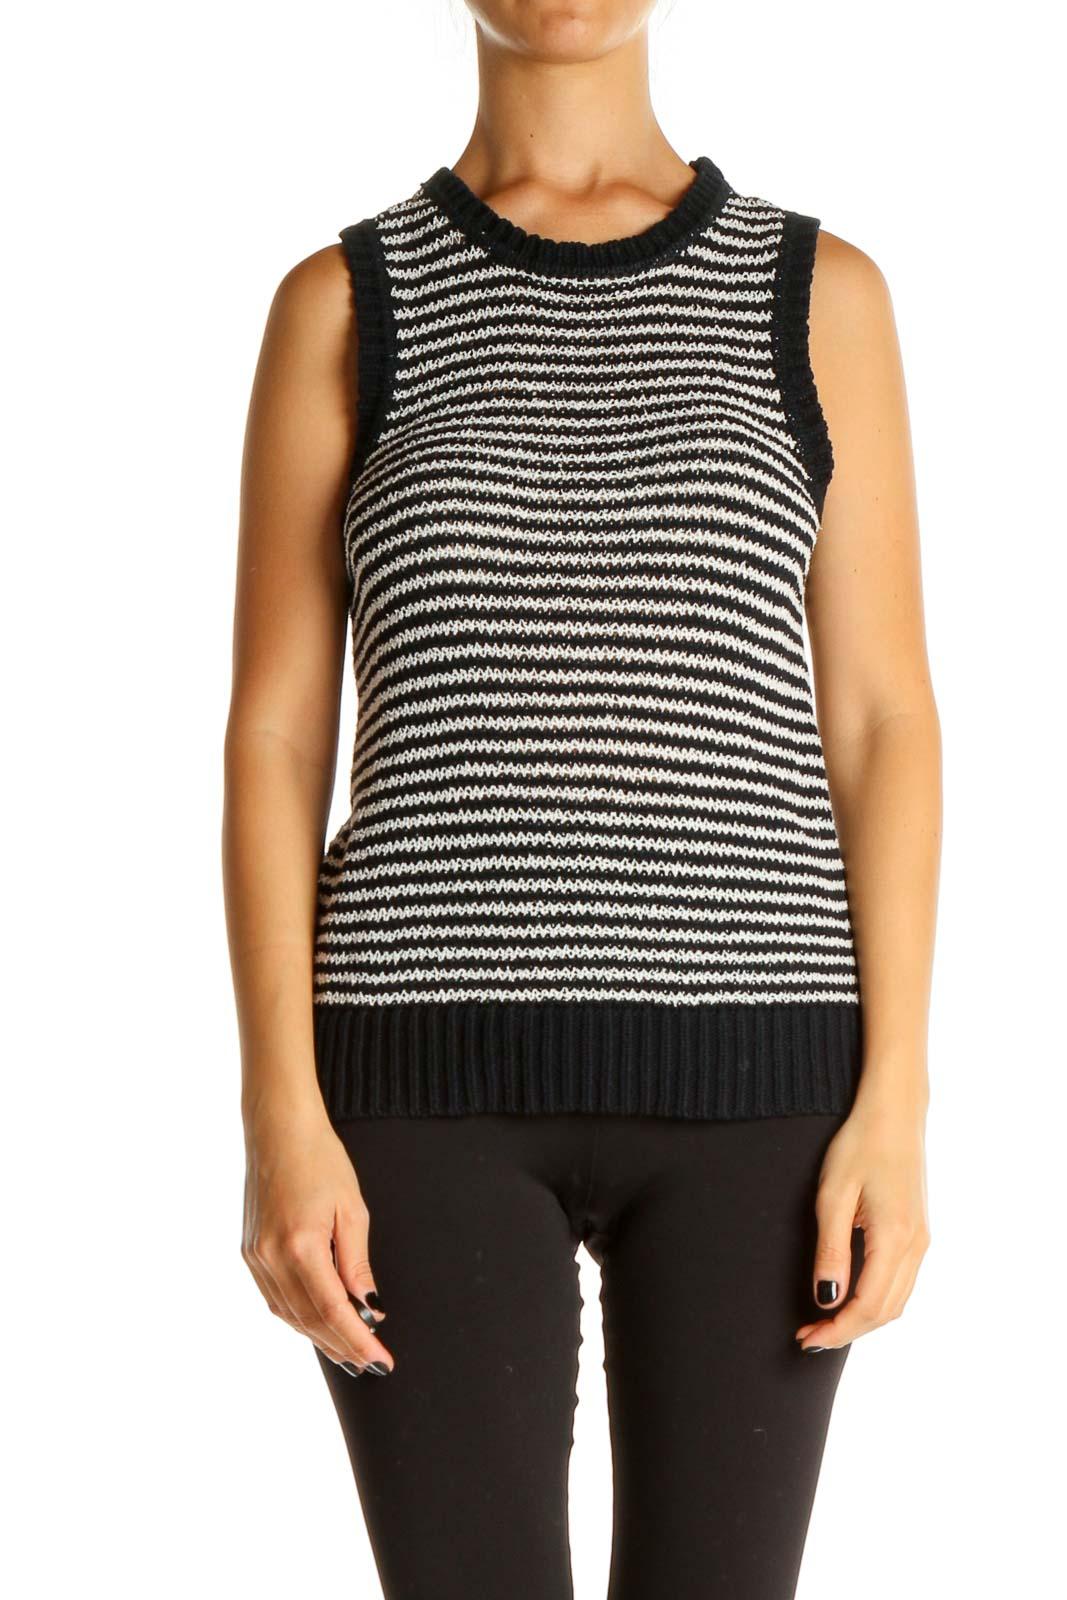 Black Striped Brunch Sweater Front